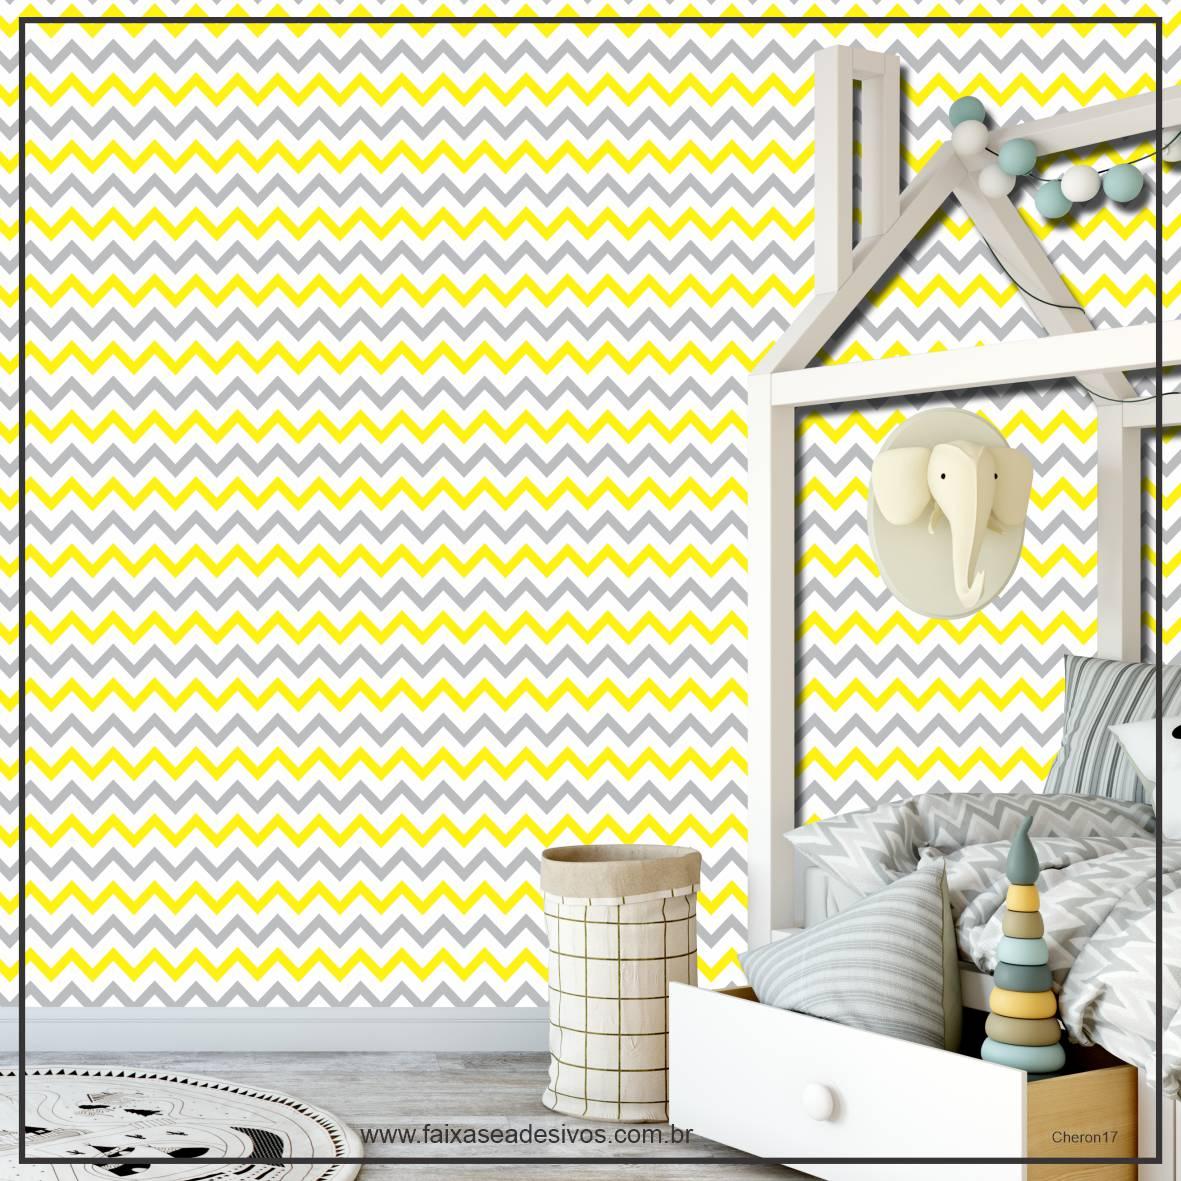 013 - Adesivo Decorativo de parede Chevron amarelo - 58cm larg  - Fac Signs